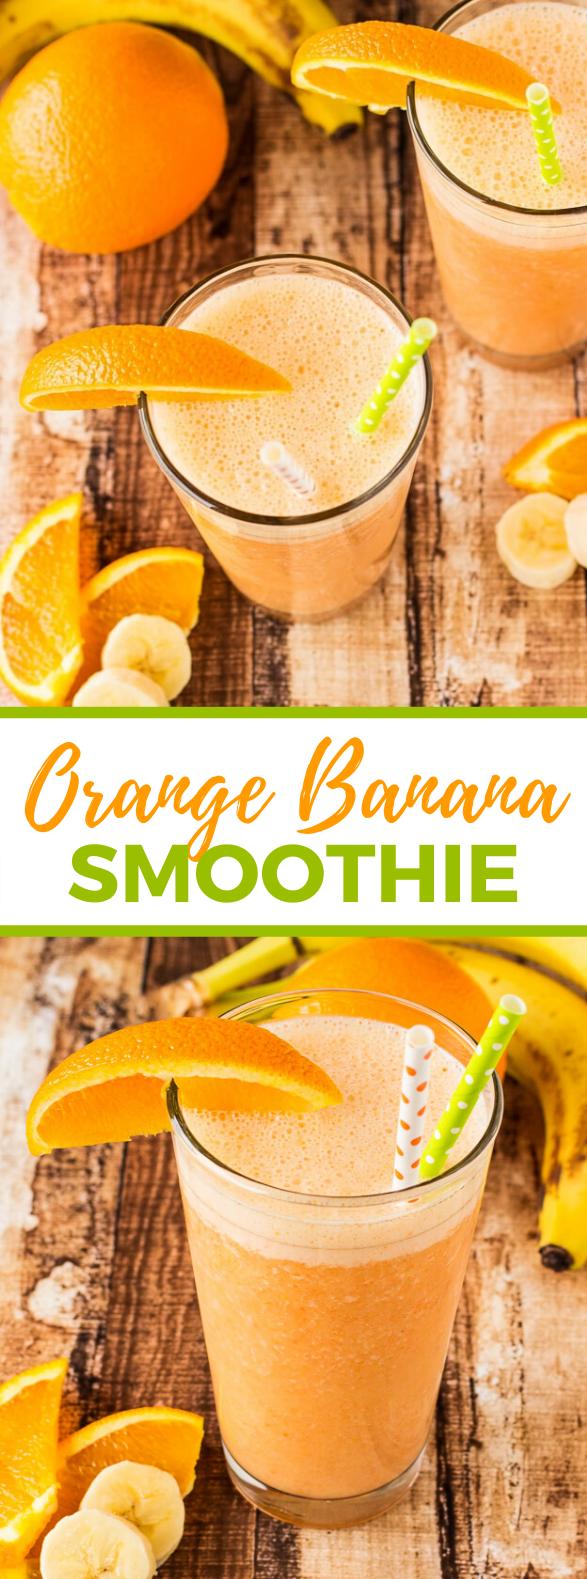 Orange Banana Smoothie #drinks #freshdrink